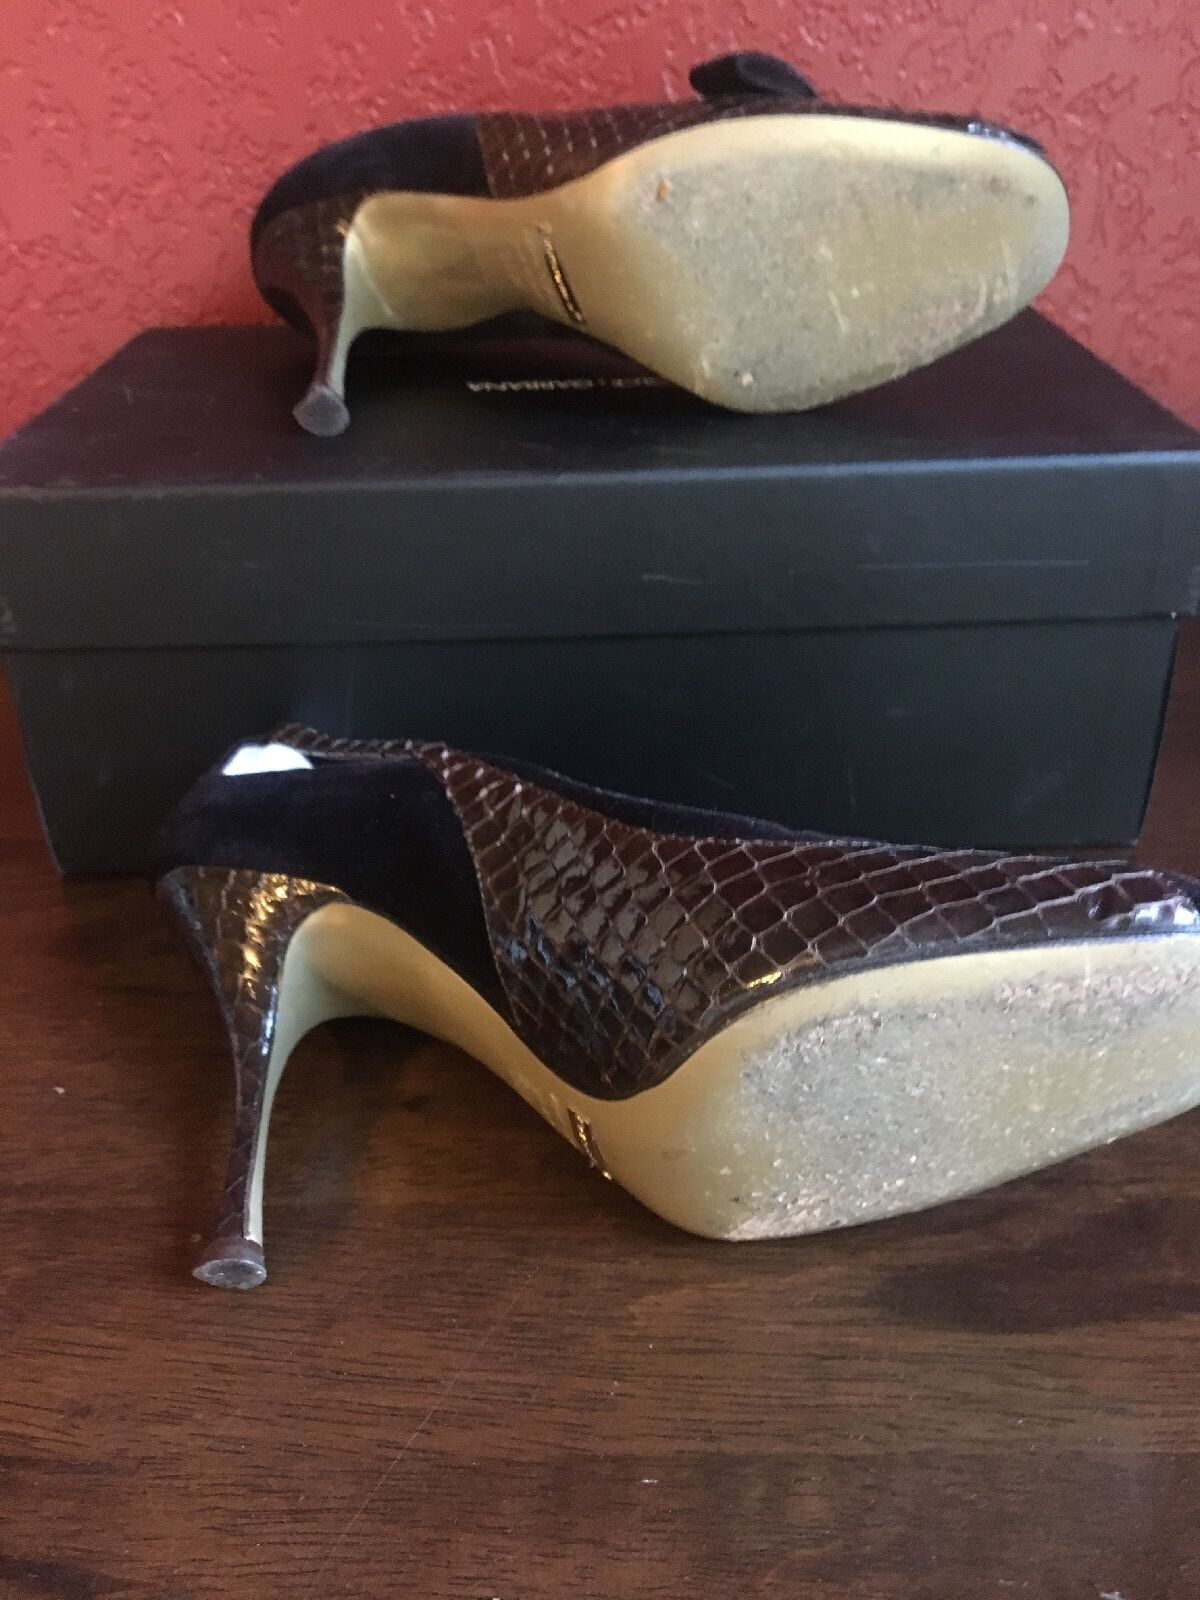 Dolce Gabbana Damens Schuhes 38-1/2 Skin/suede Braun Snake Skin/suede 38-1/2 5aeb10